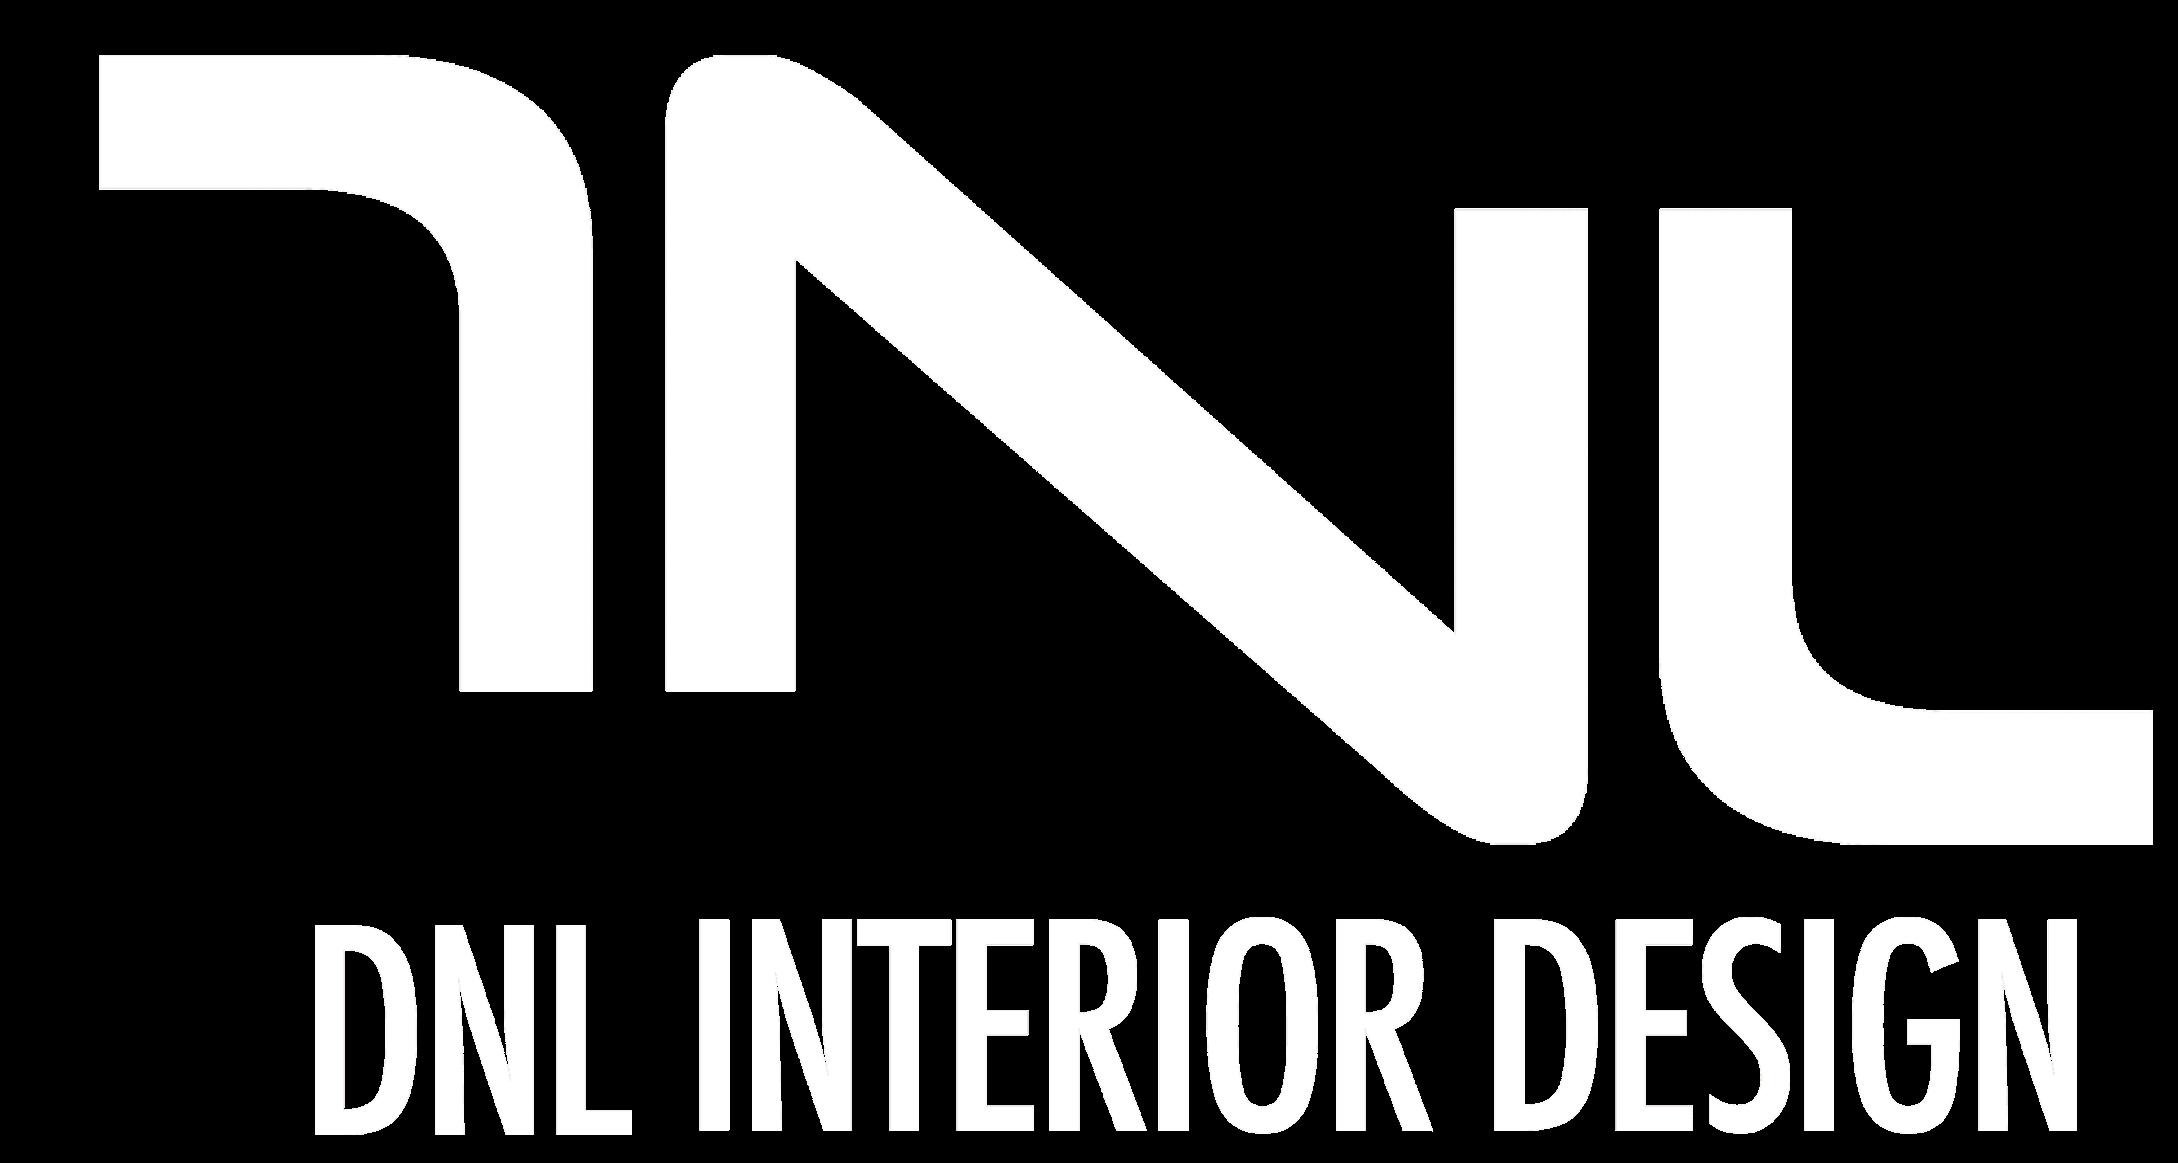 DNL Design